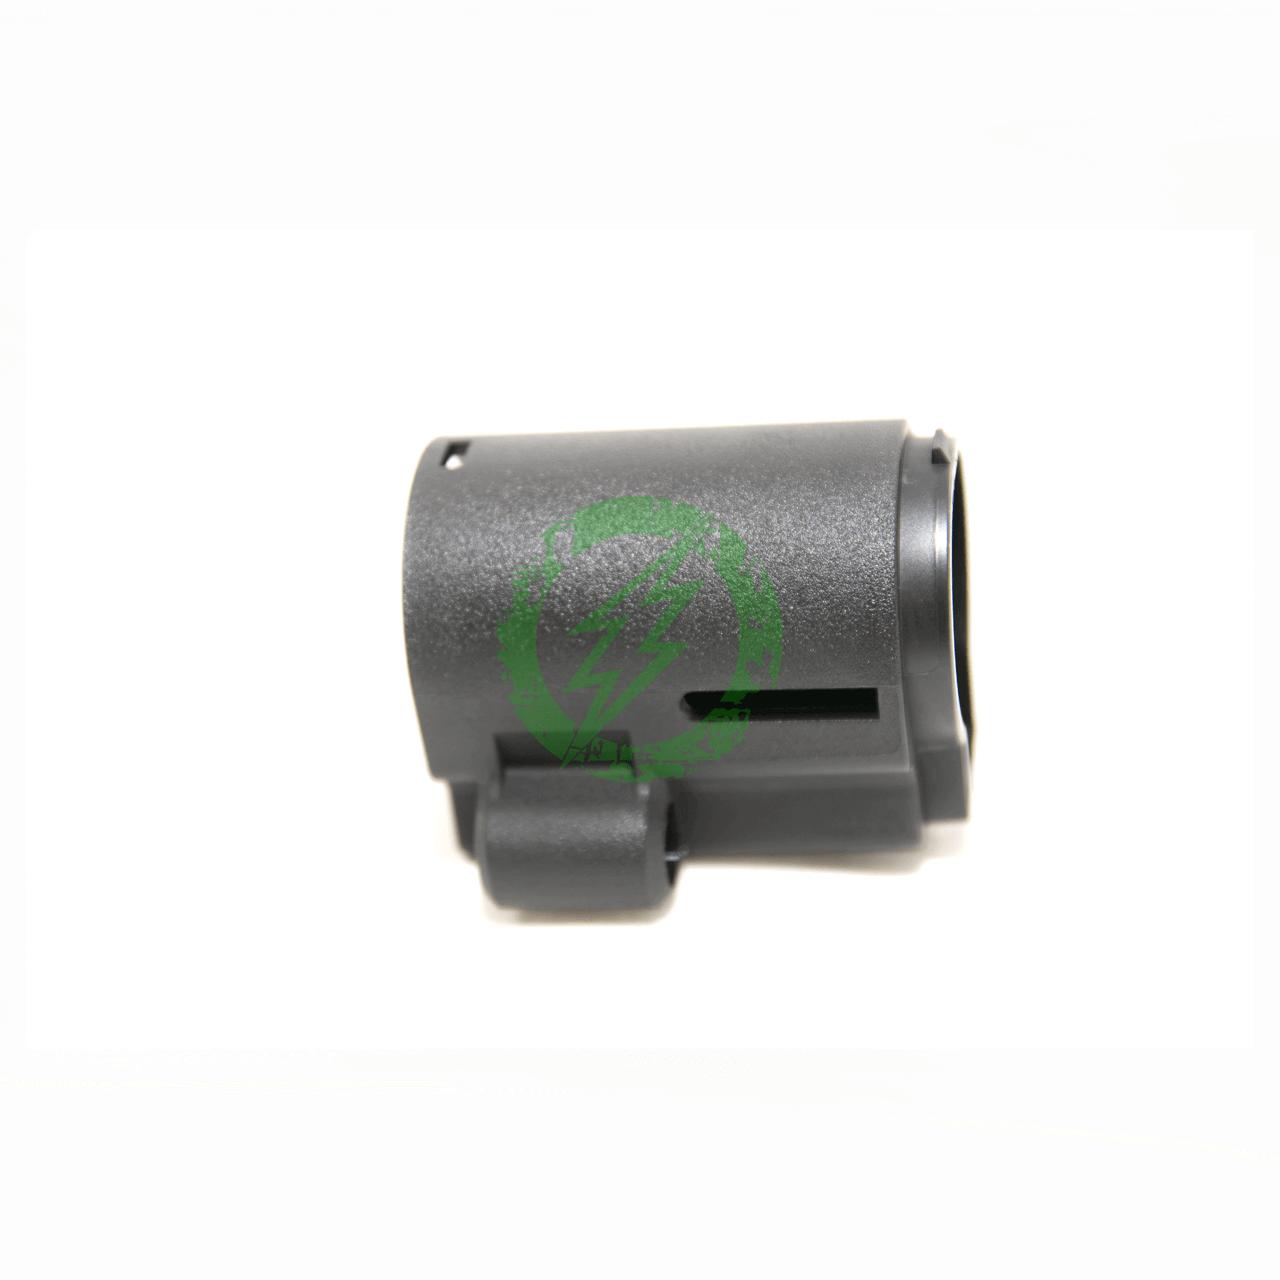 Airtech Studios - BEU Battery Extension Unit   ARP9 / ARP556 / Raider 2.0 E Long side